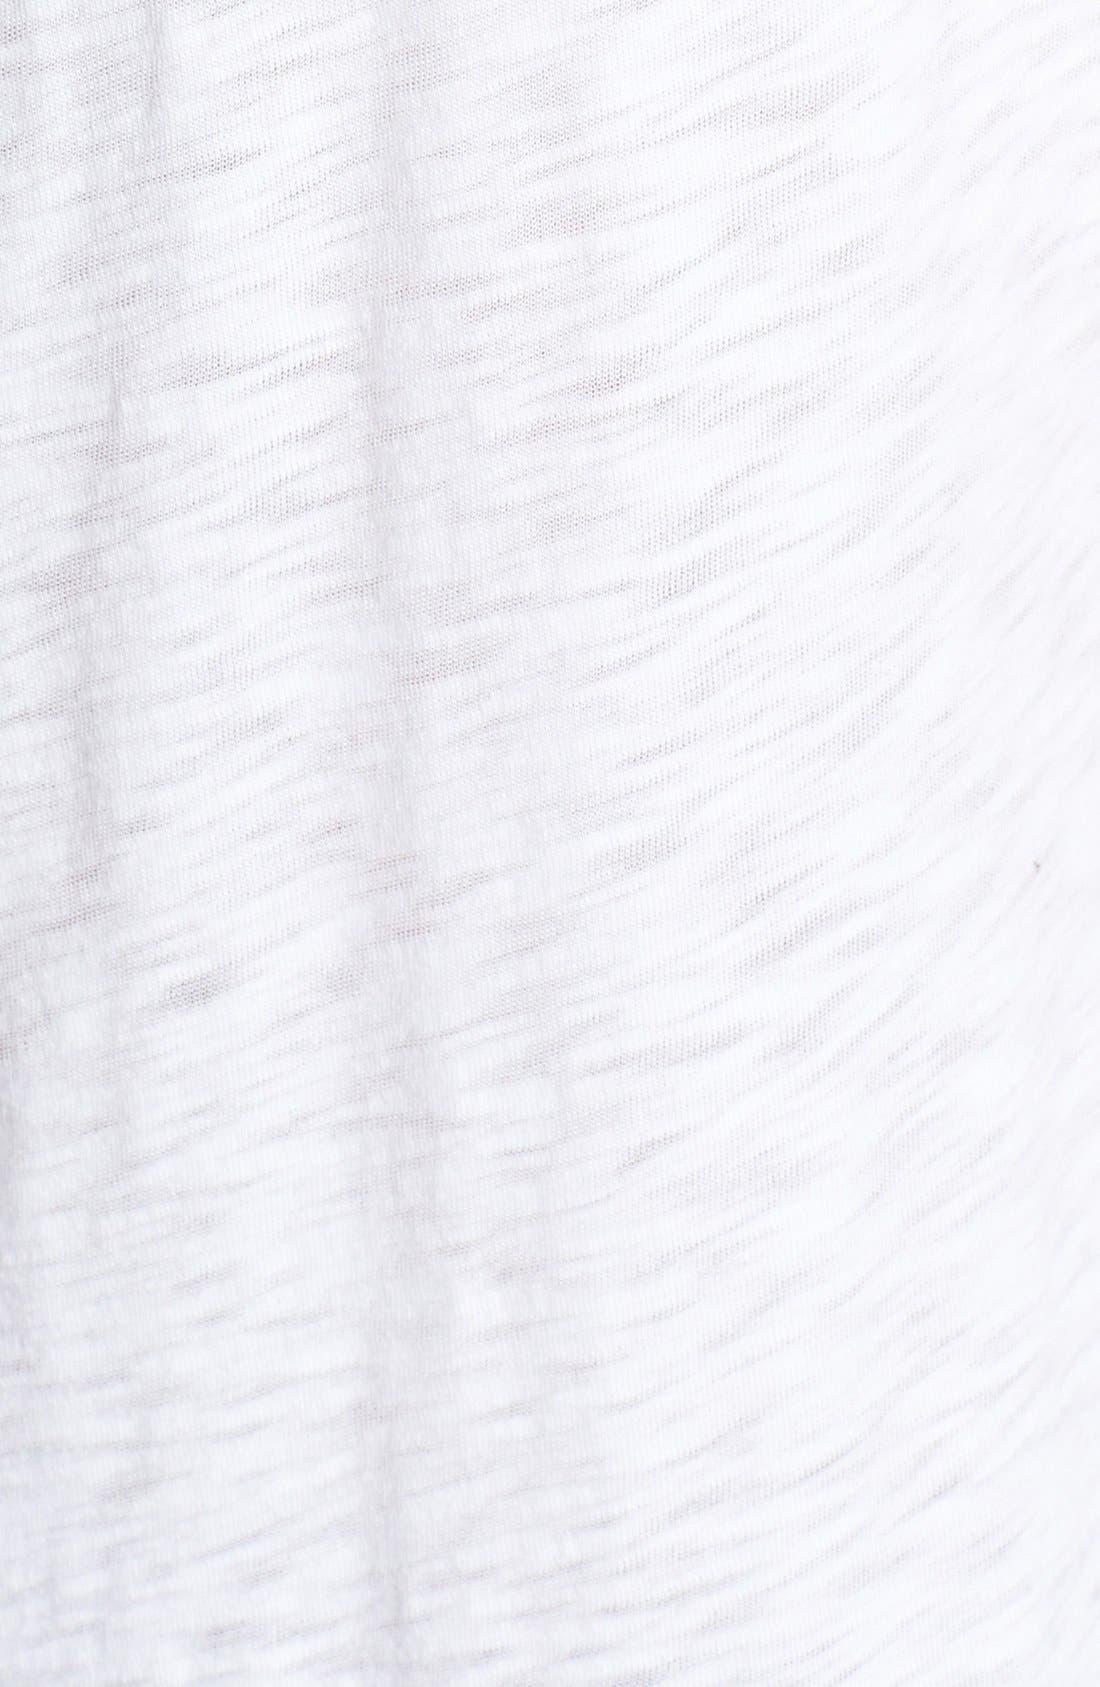 Alternate Image 3  - rag & bone/JEAN 'The Classic' Slub Cotton Tee